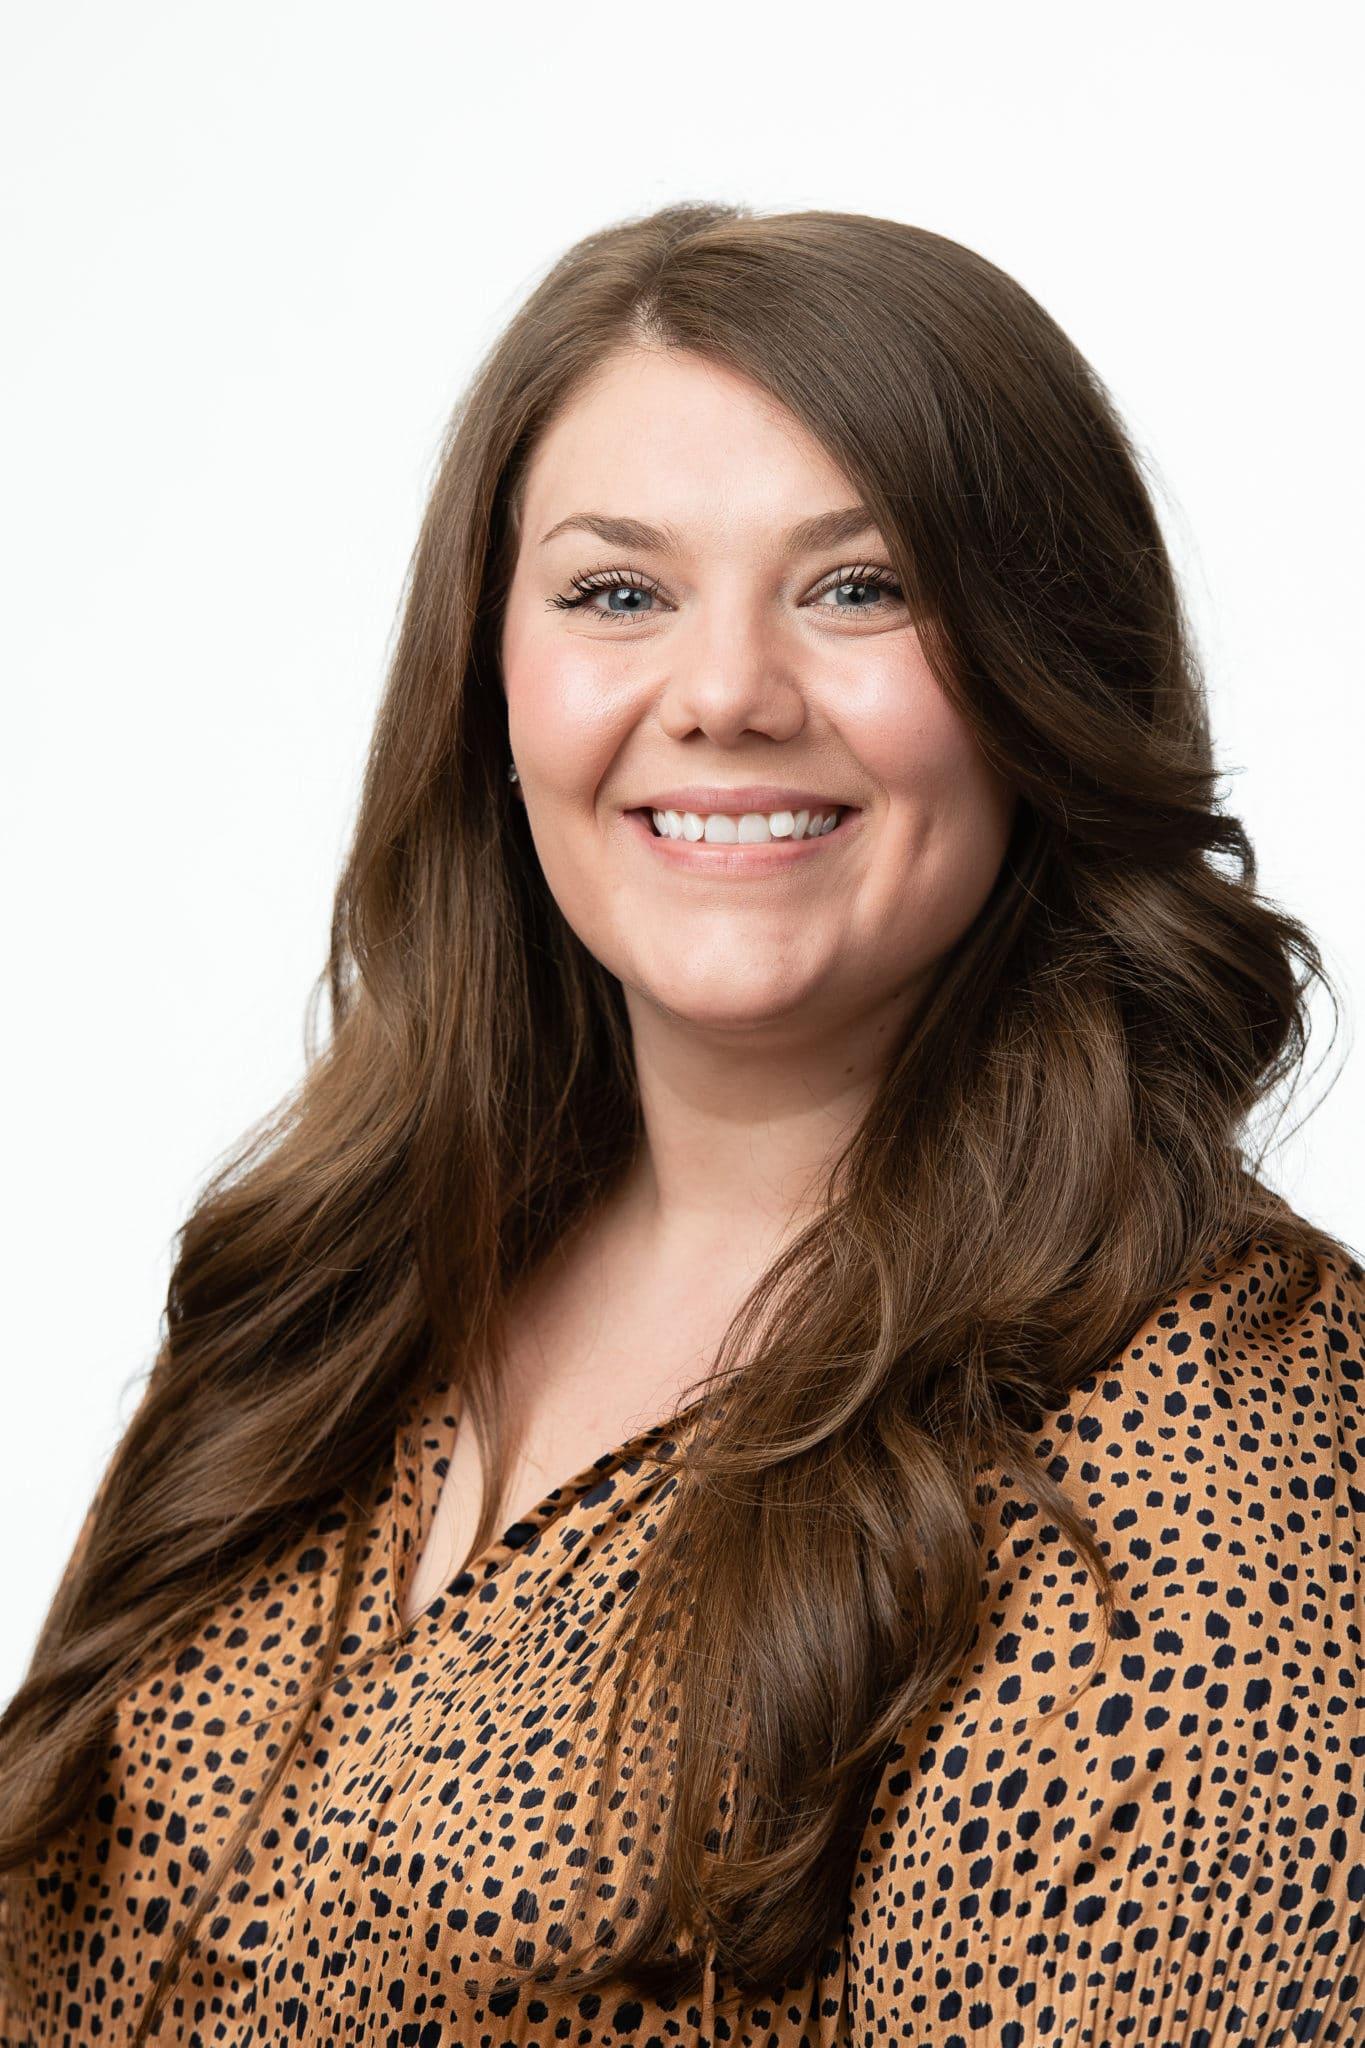 Kimberly Richardson, APRN, FNP-C